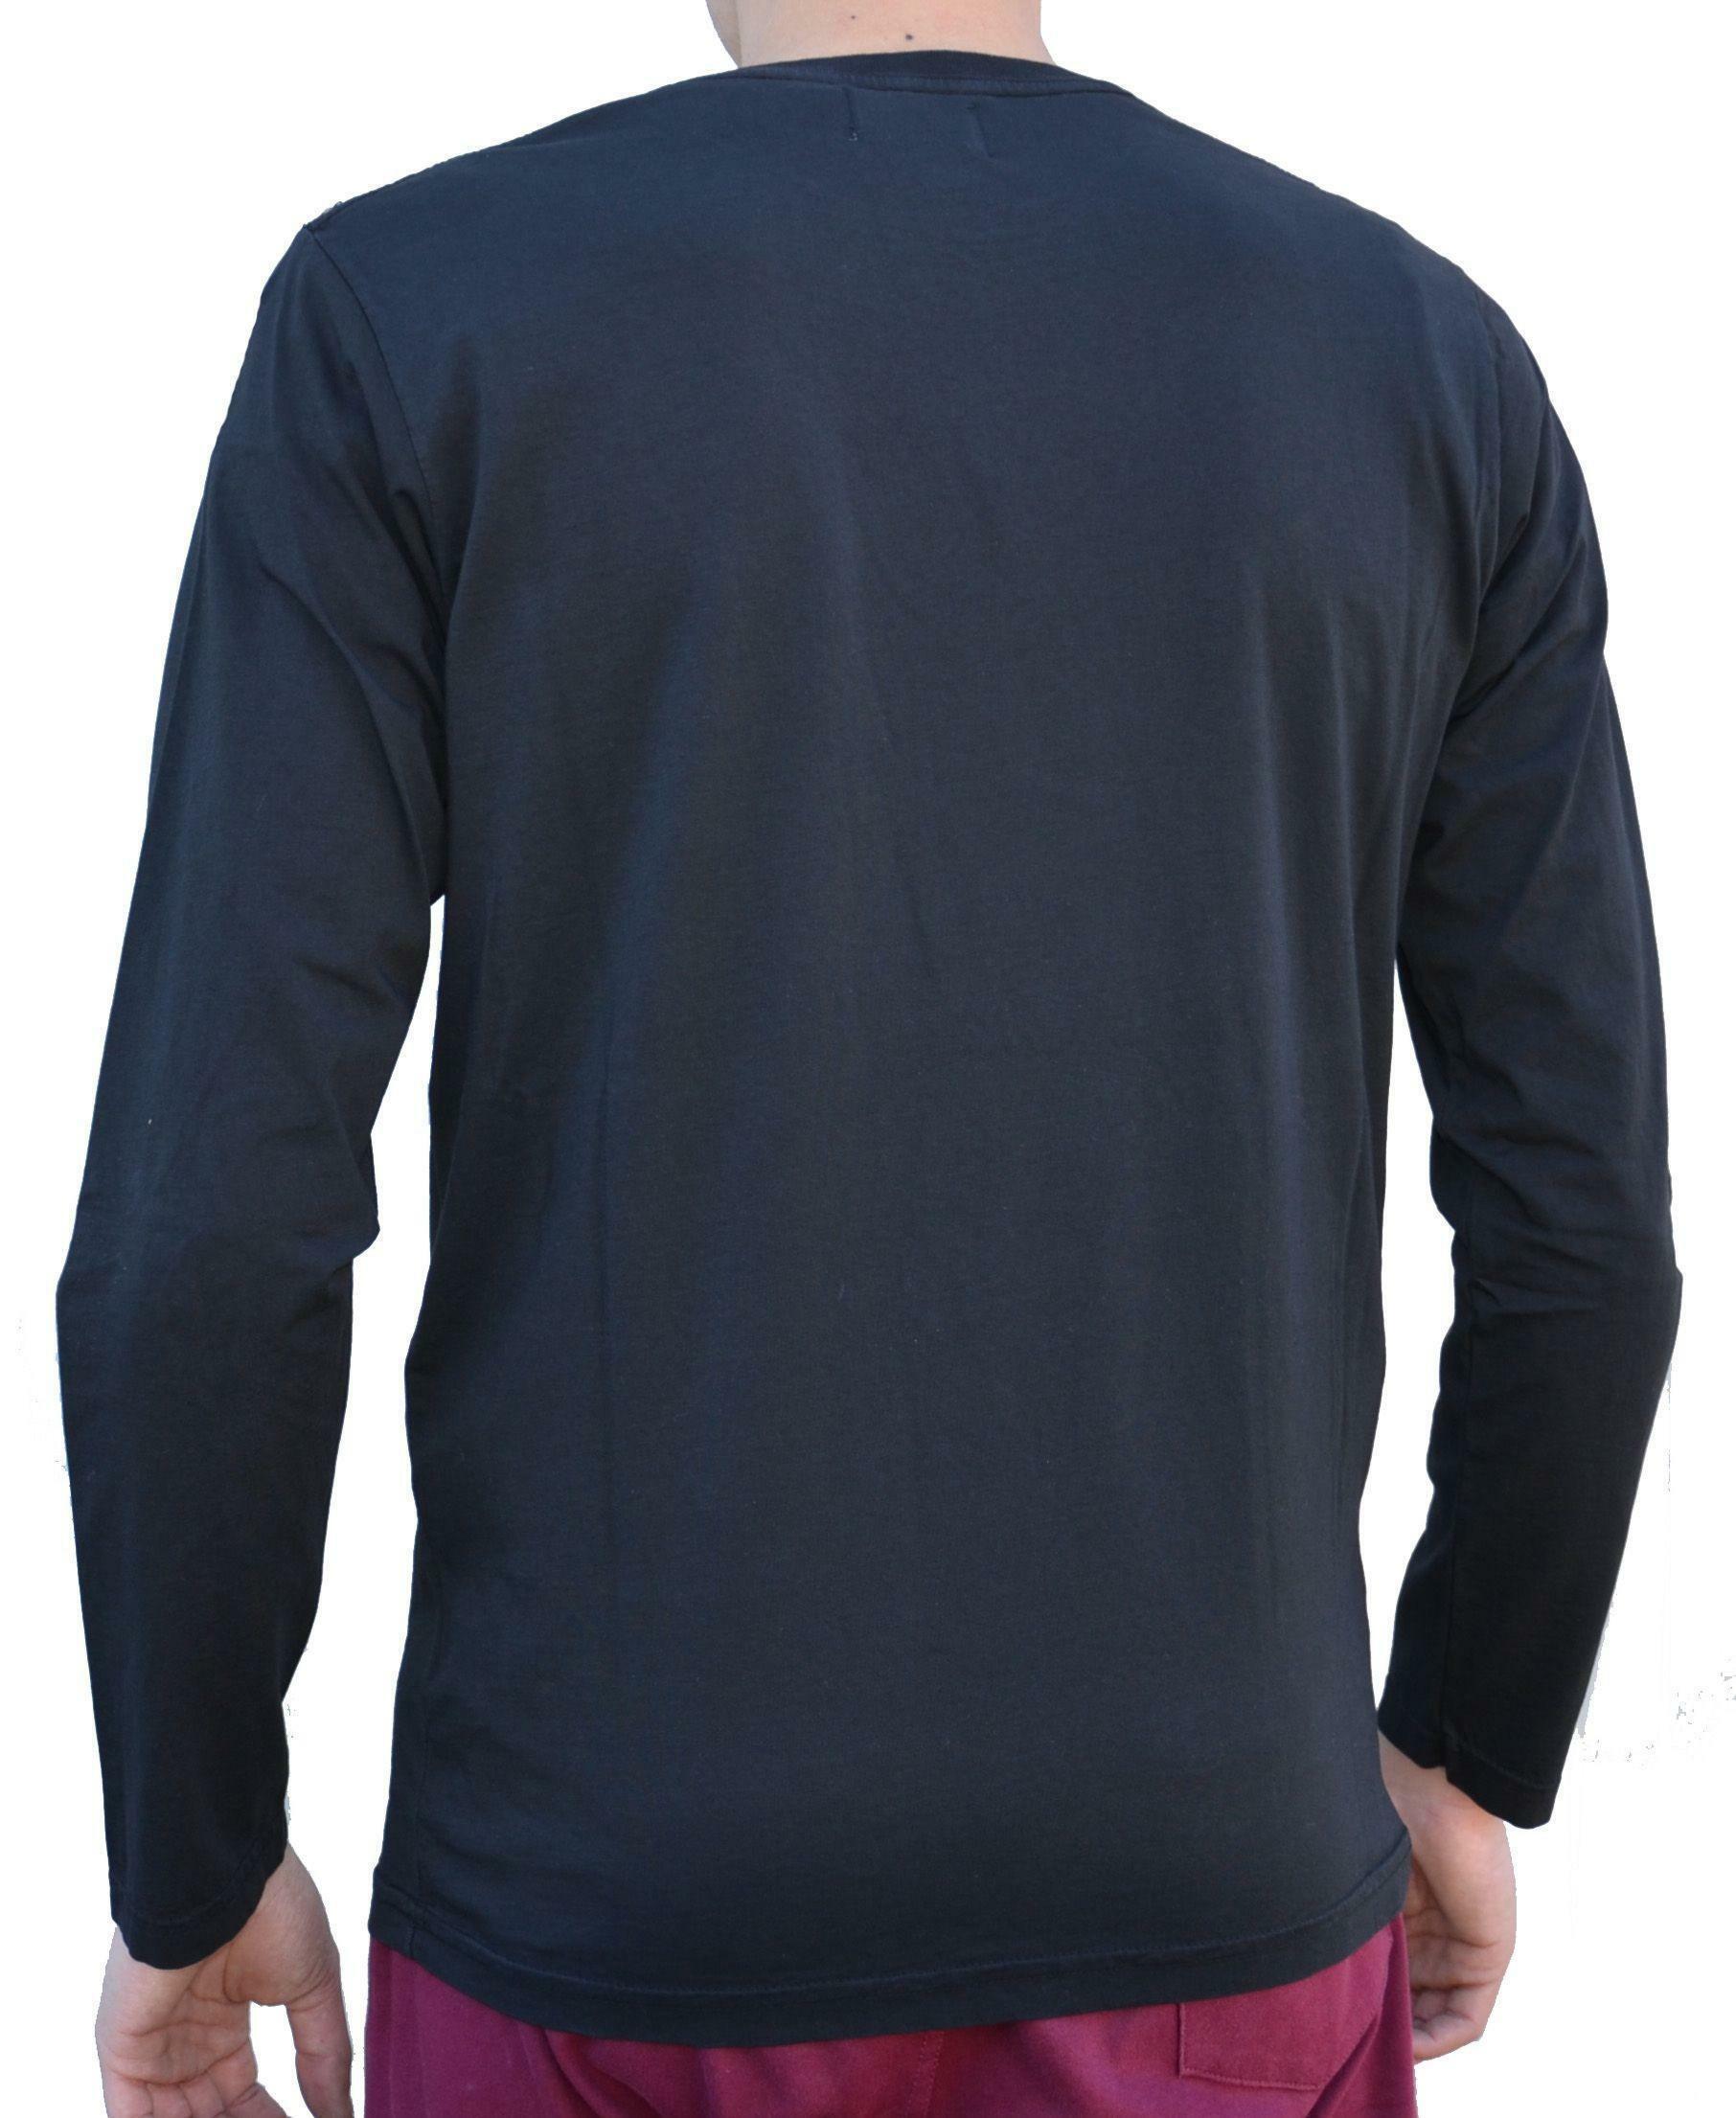 converse maglia maniche lunghe uomo nera